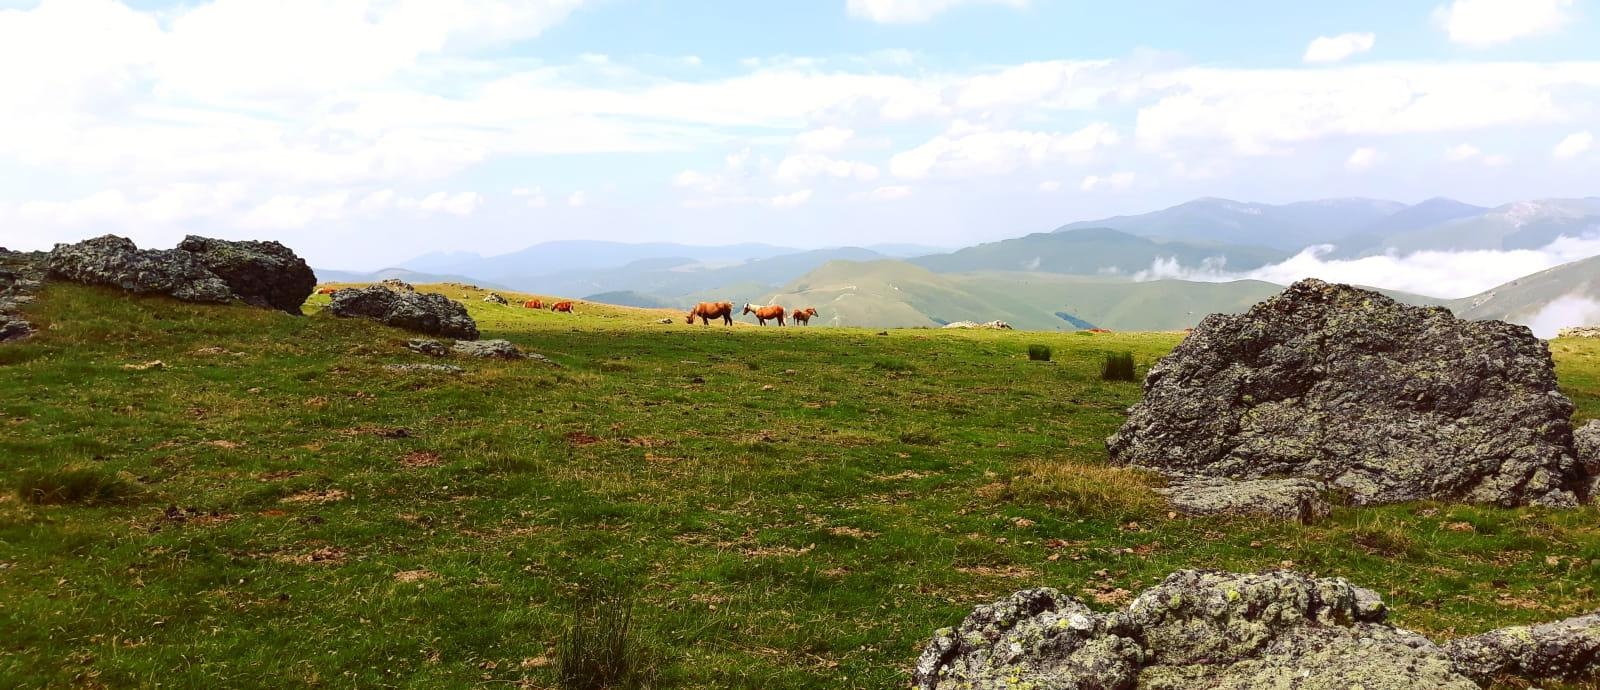 arrivee du brouillardet pottoks sur le sommet okabe - foret iraty - pays basque